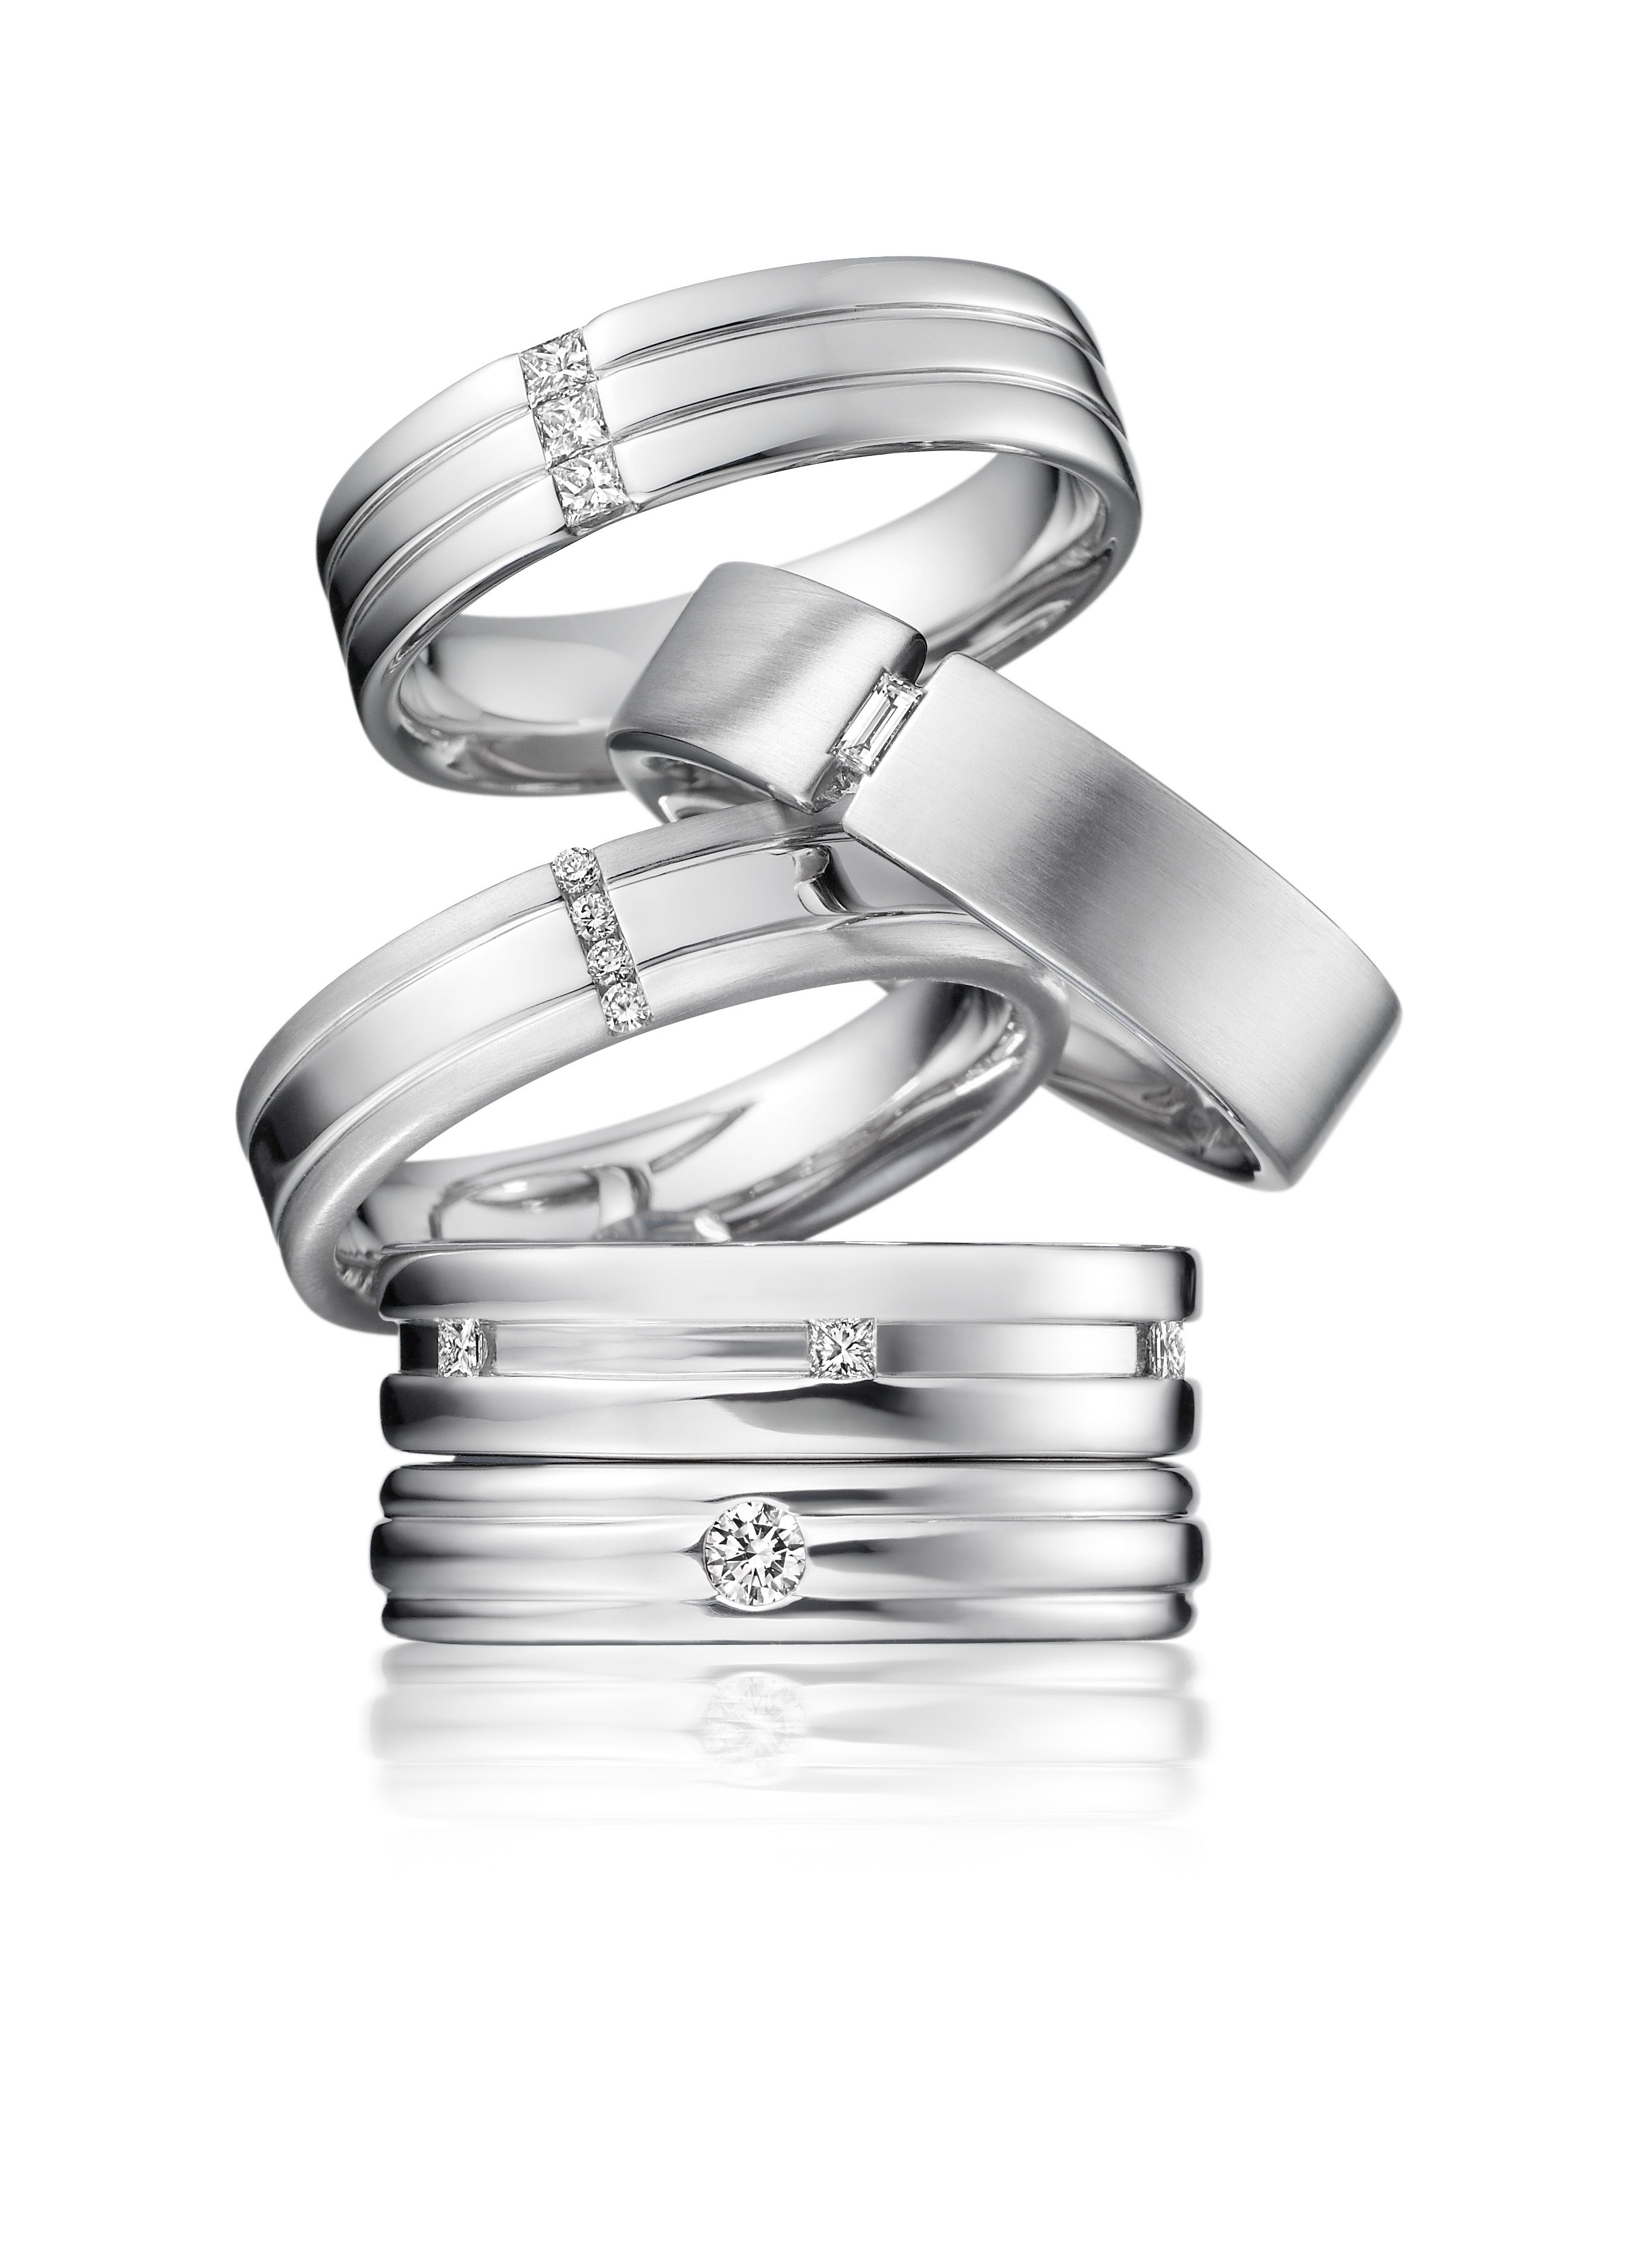 Pin by Jewellery & Watch on Fine & Diamond Jewellery